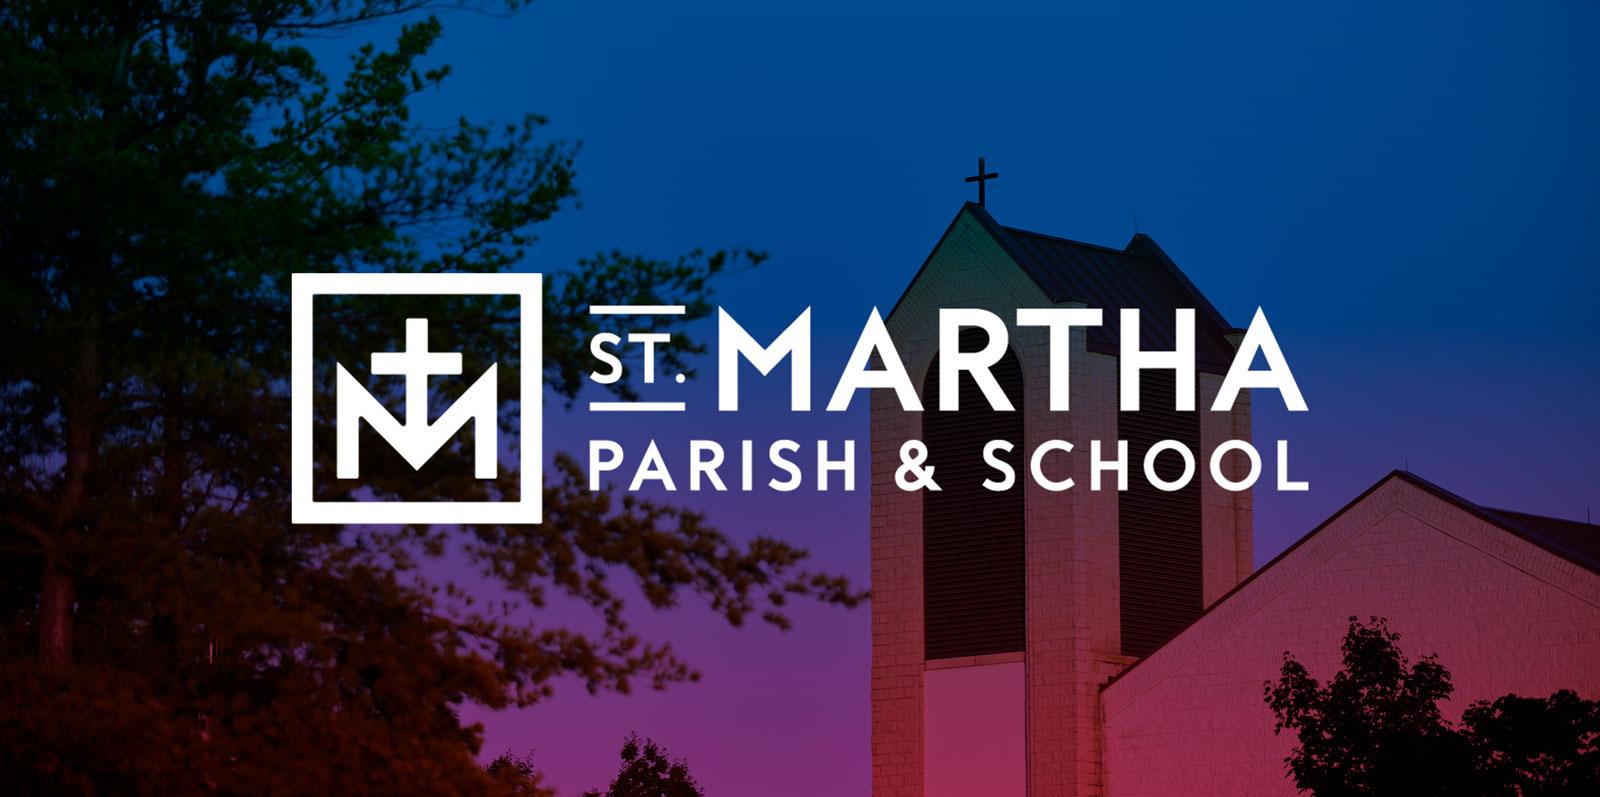 St-Martha_Exterior_08-23-2018-009